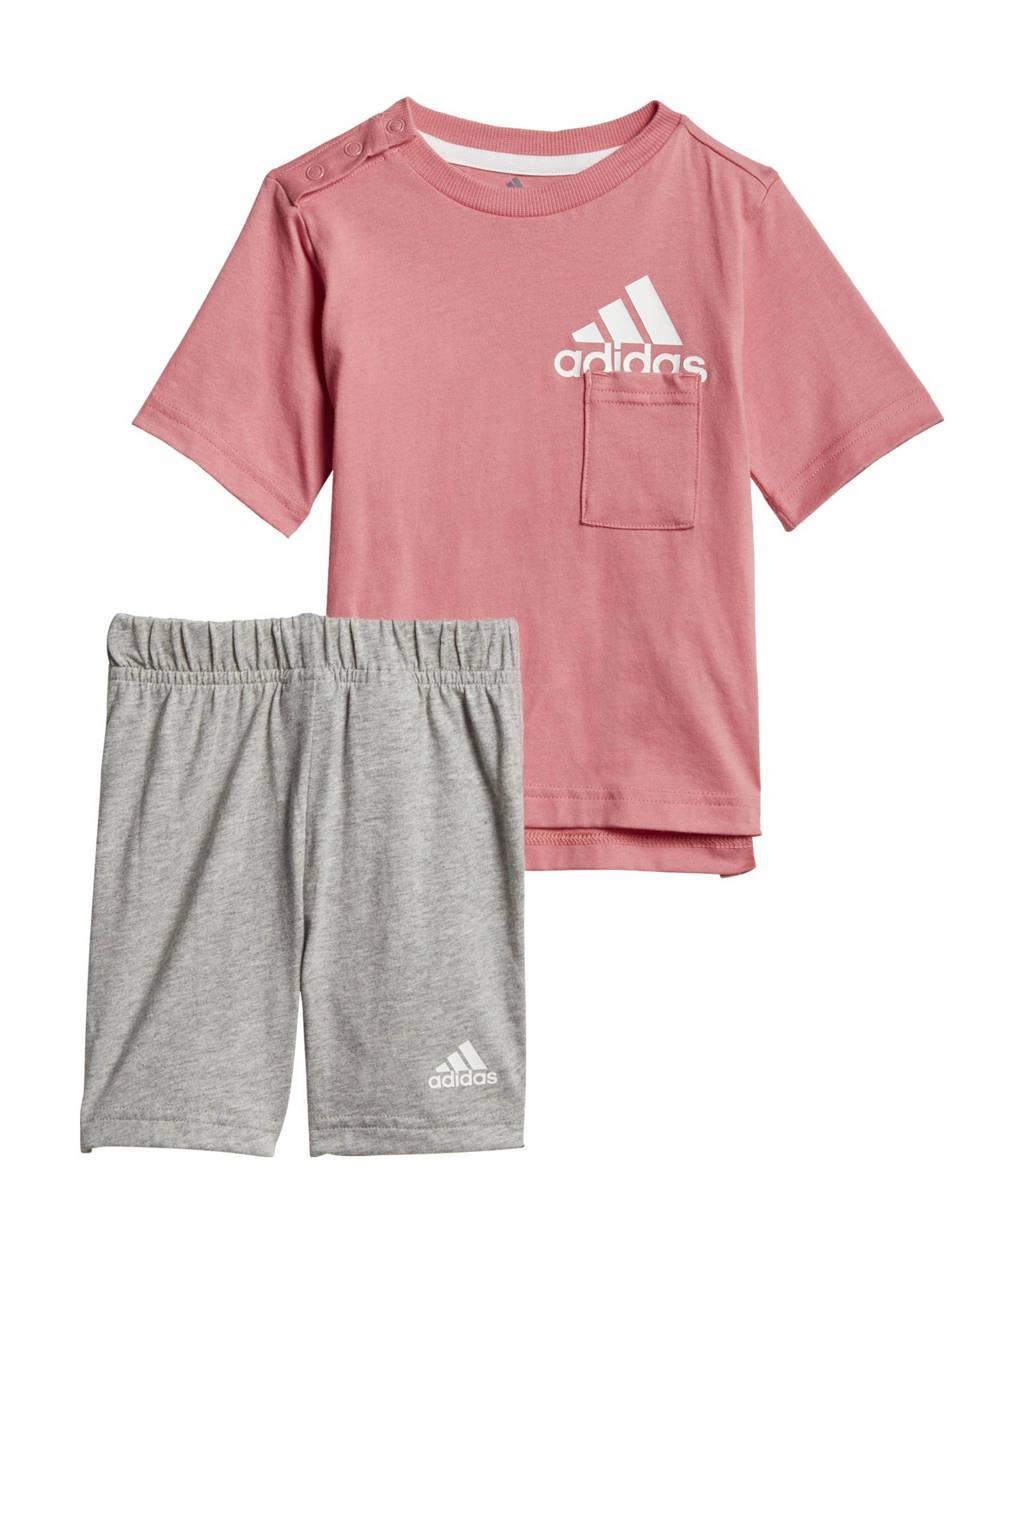 adidas Performance   sportset roze/wit/grijs melange, Roze/wit/grijs melange